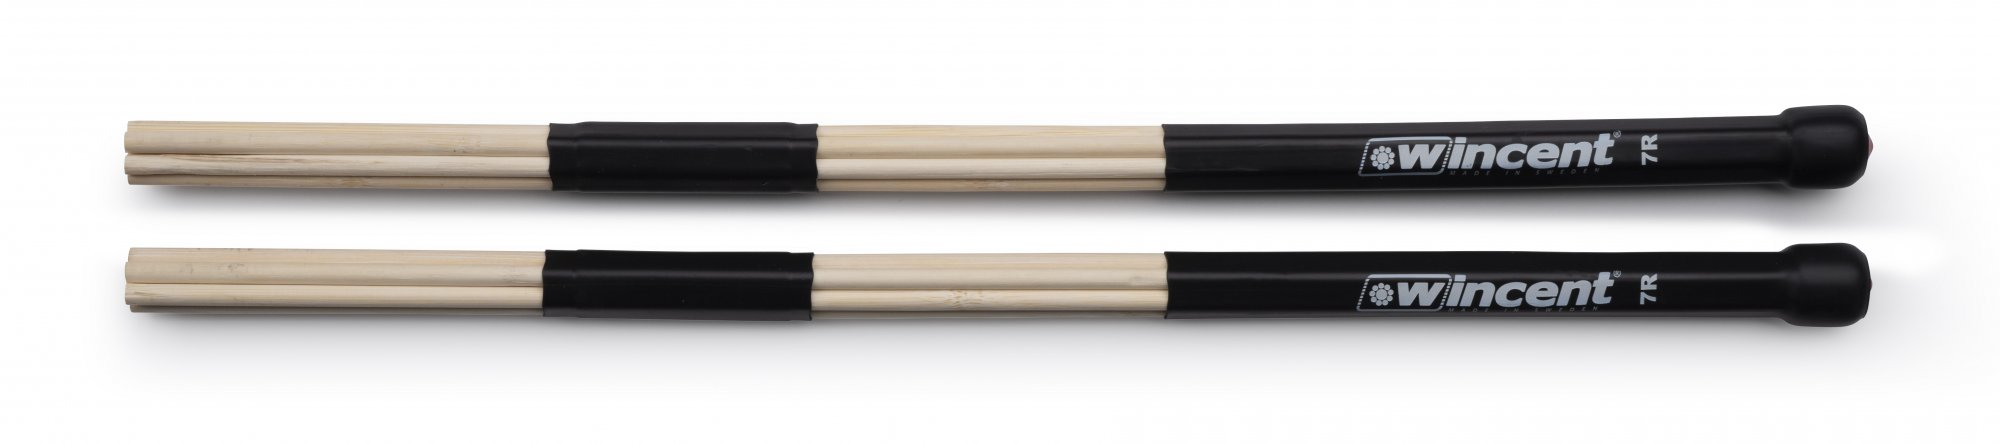 Wincent W7R Bamboo ClusterSticks, 7 Dowel